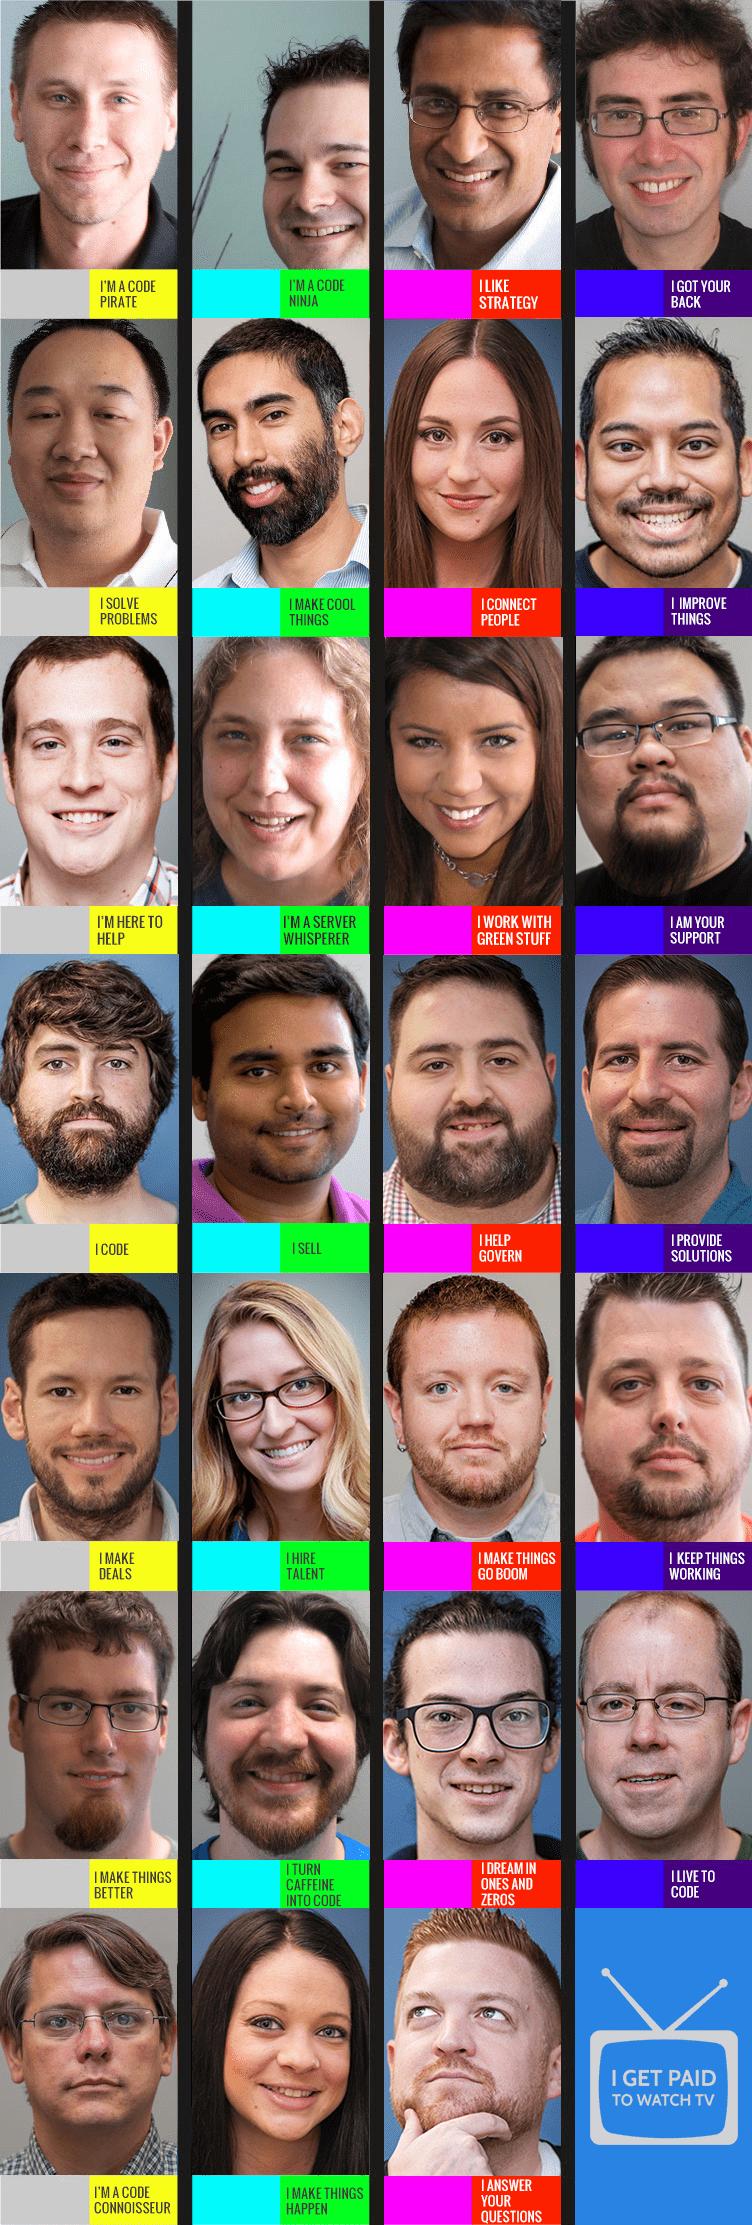 SnapStream team